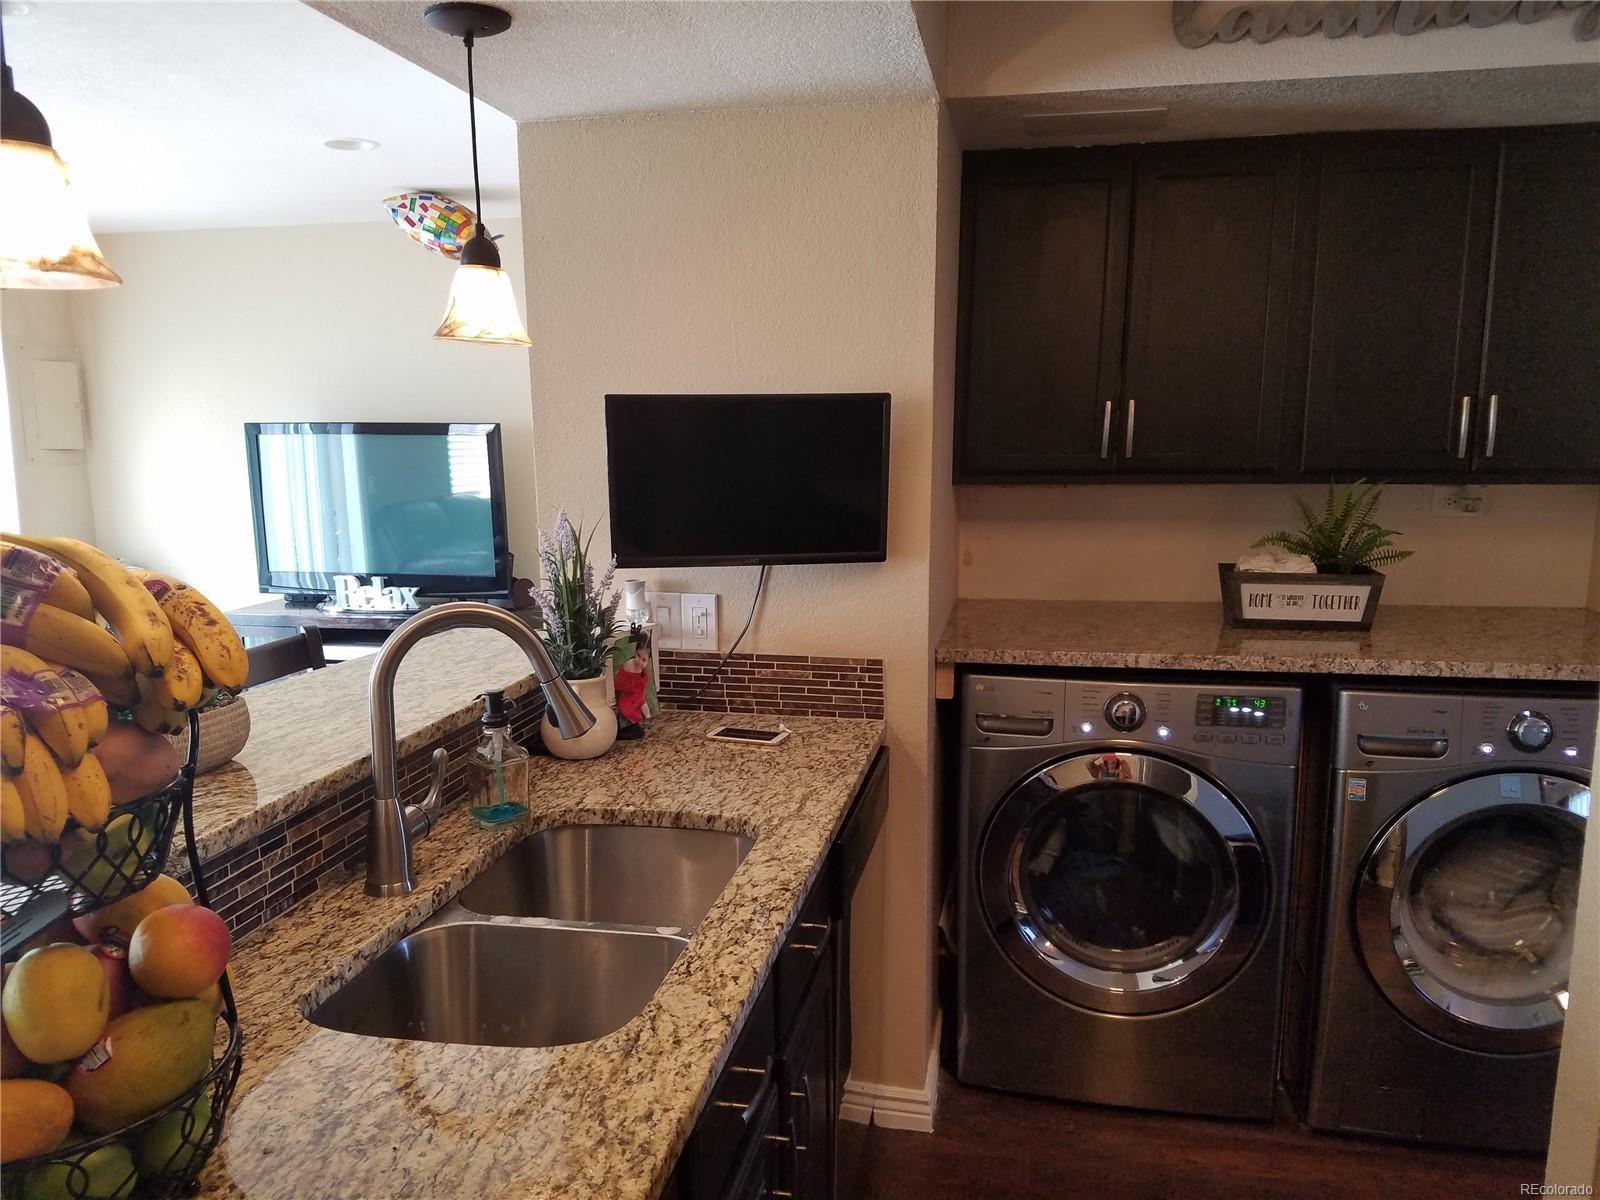 MLS# 6878459 - 9 - 12162 E Kepner Place, Aurora, CO 80012